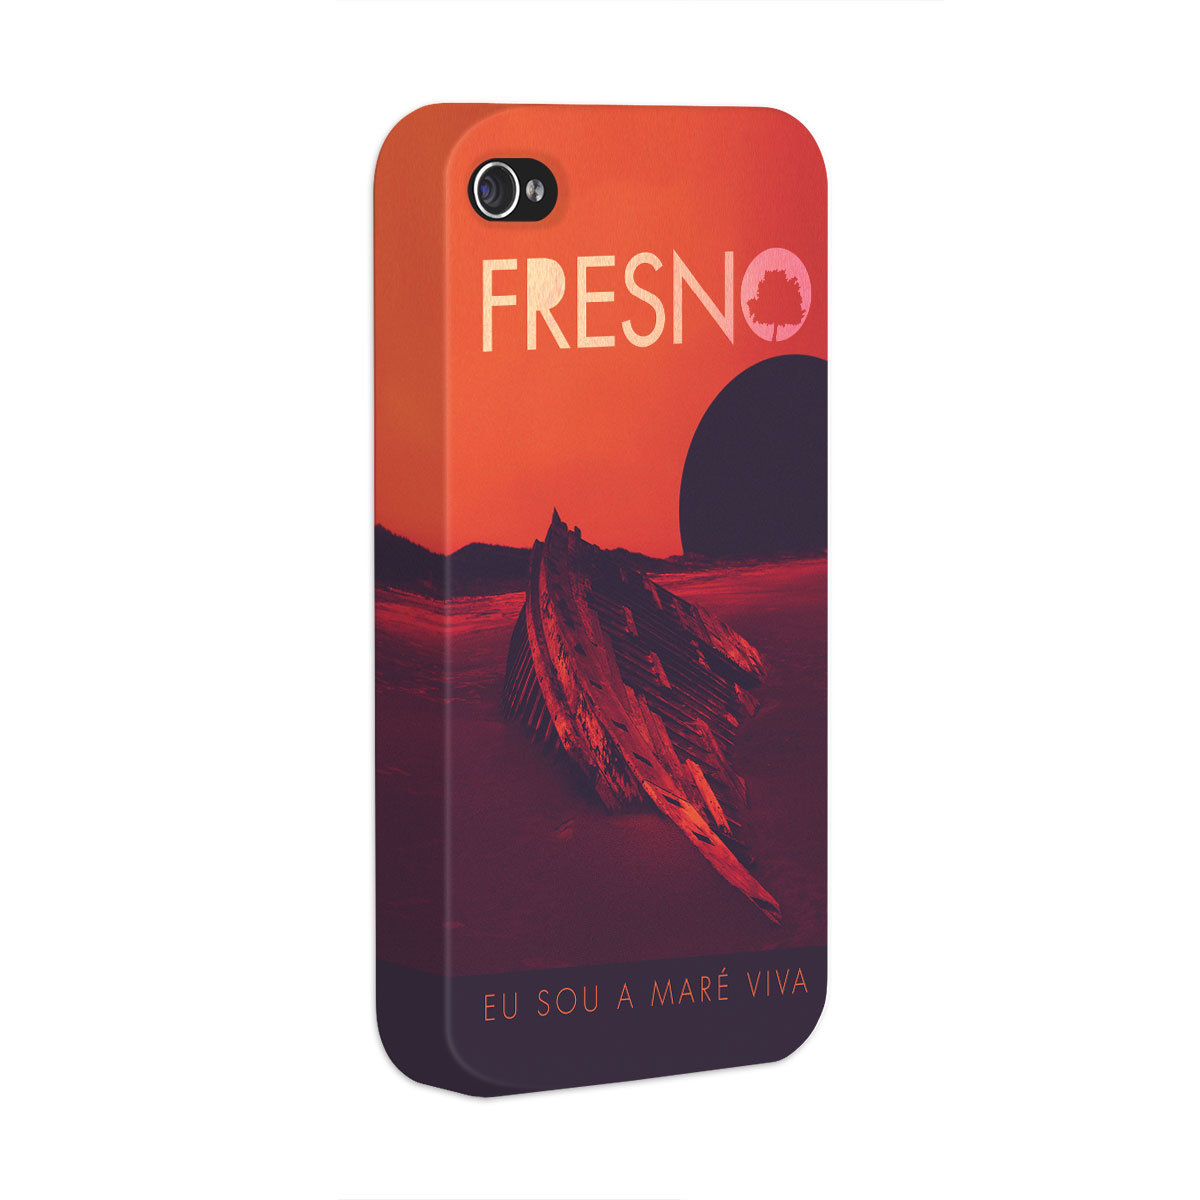 Capa para Iphone 4/4S Fresno Capa EP